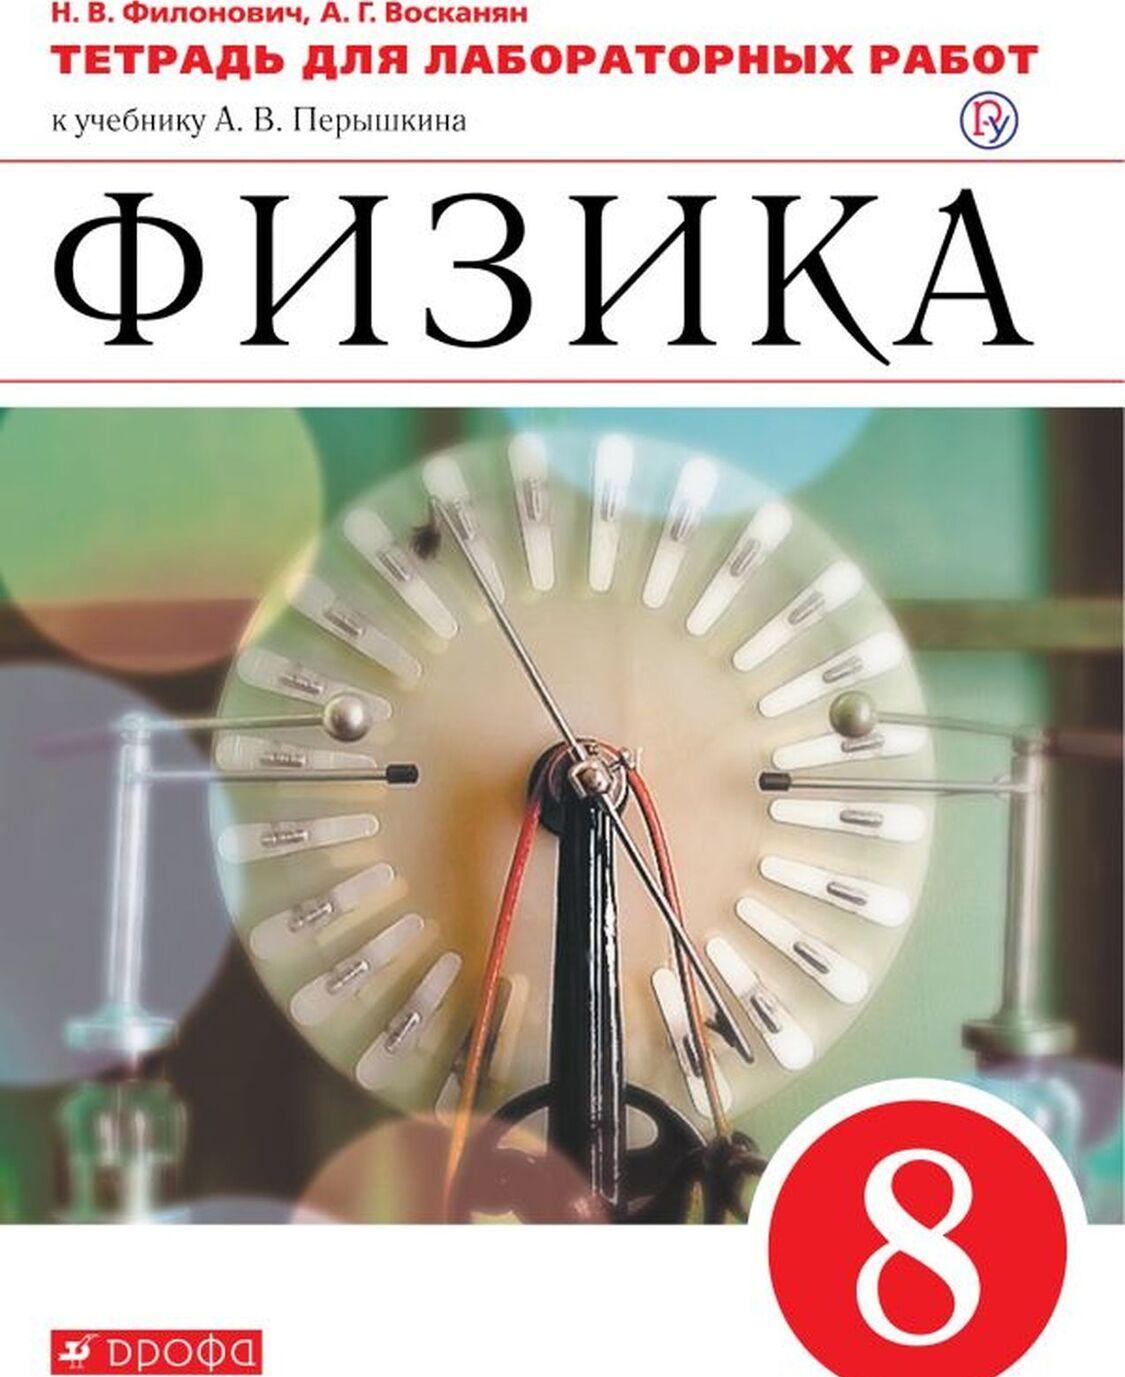 Fizika. 8 klass. Tetrad dlja laboratornykh rabot. K uchebniku A. V. Peryshkina | Filonovich Nina Vladimirovna, Voskanjan Albert Georgievich